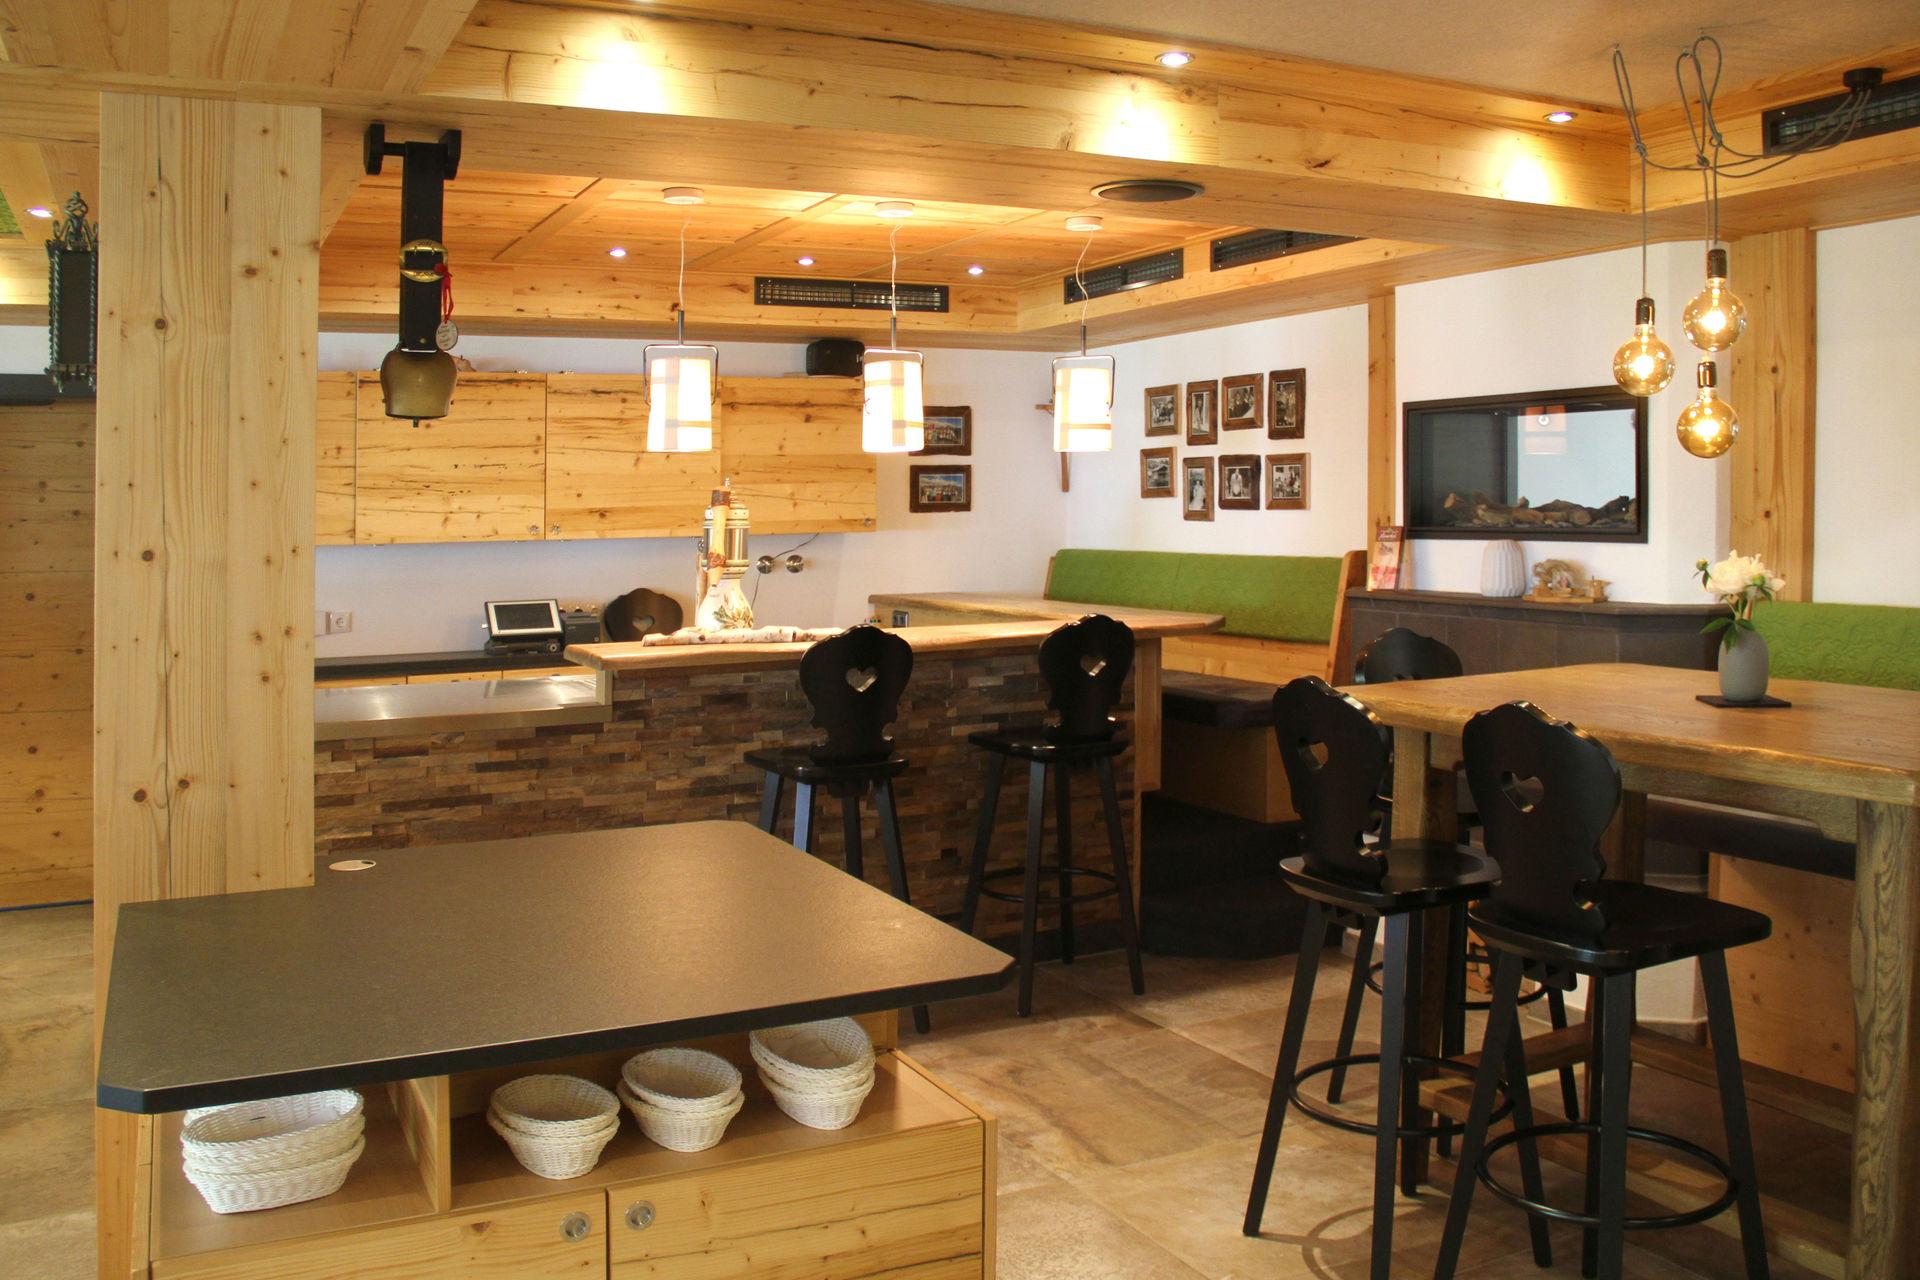 KOMPLETT-EINRICHTUNGEN Gastronomie - Restaurant, Bar, Buffet